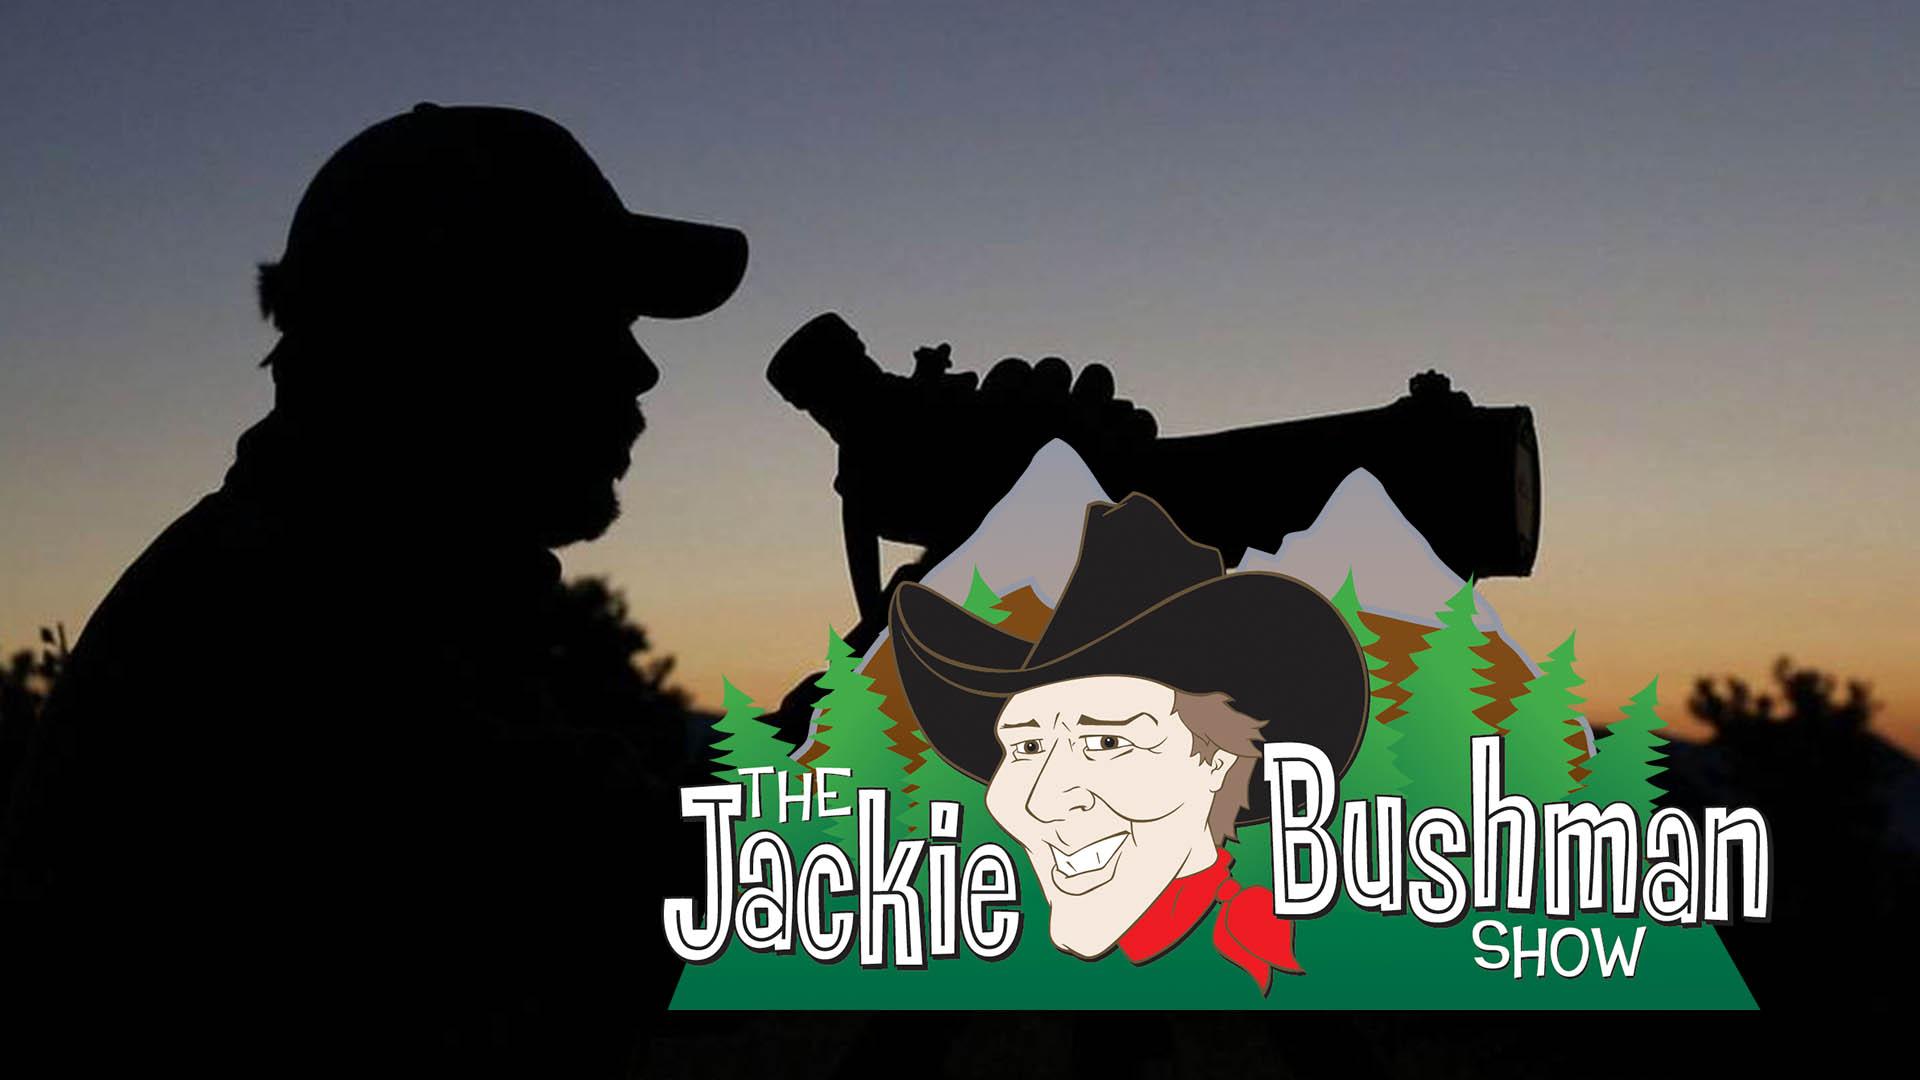 Jackie bushman sweepstakes